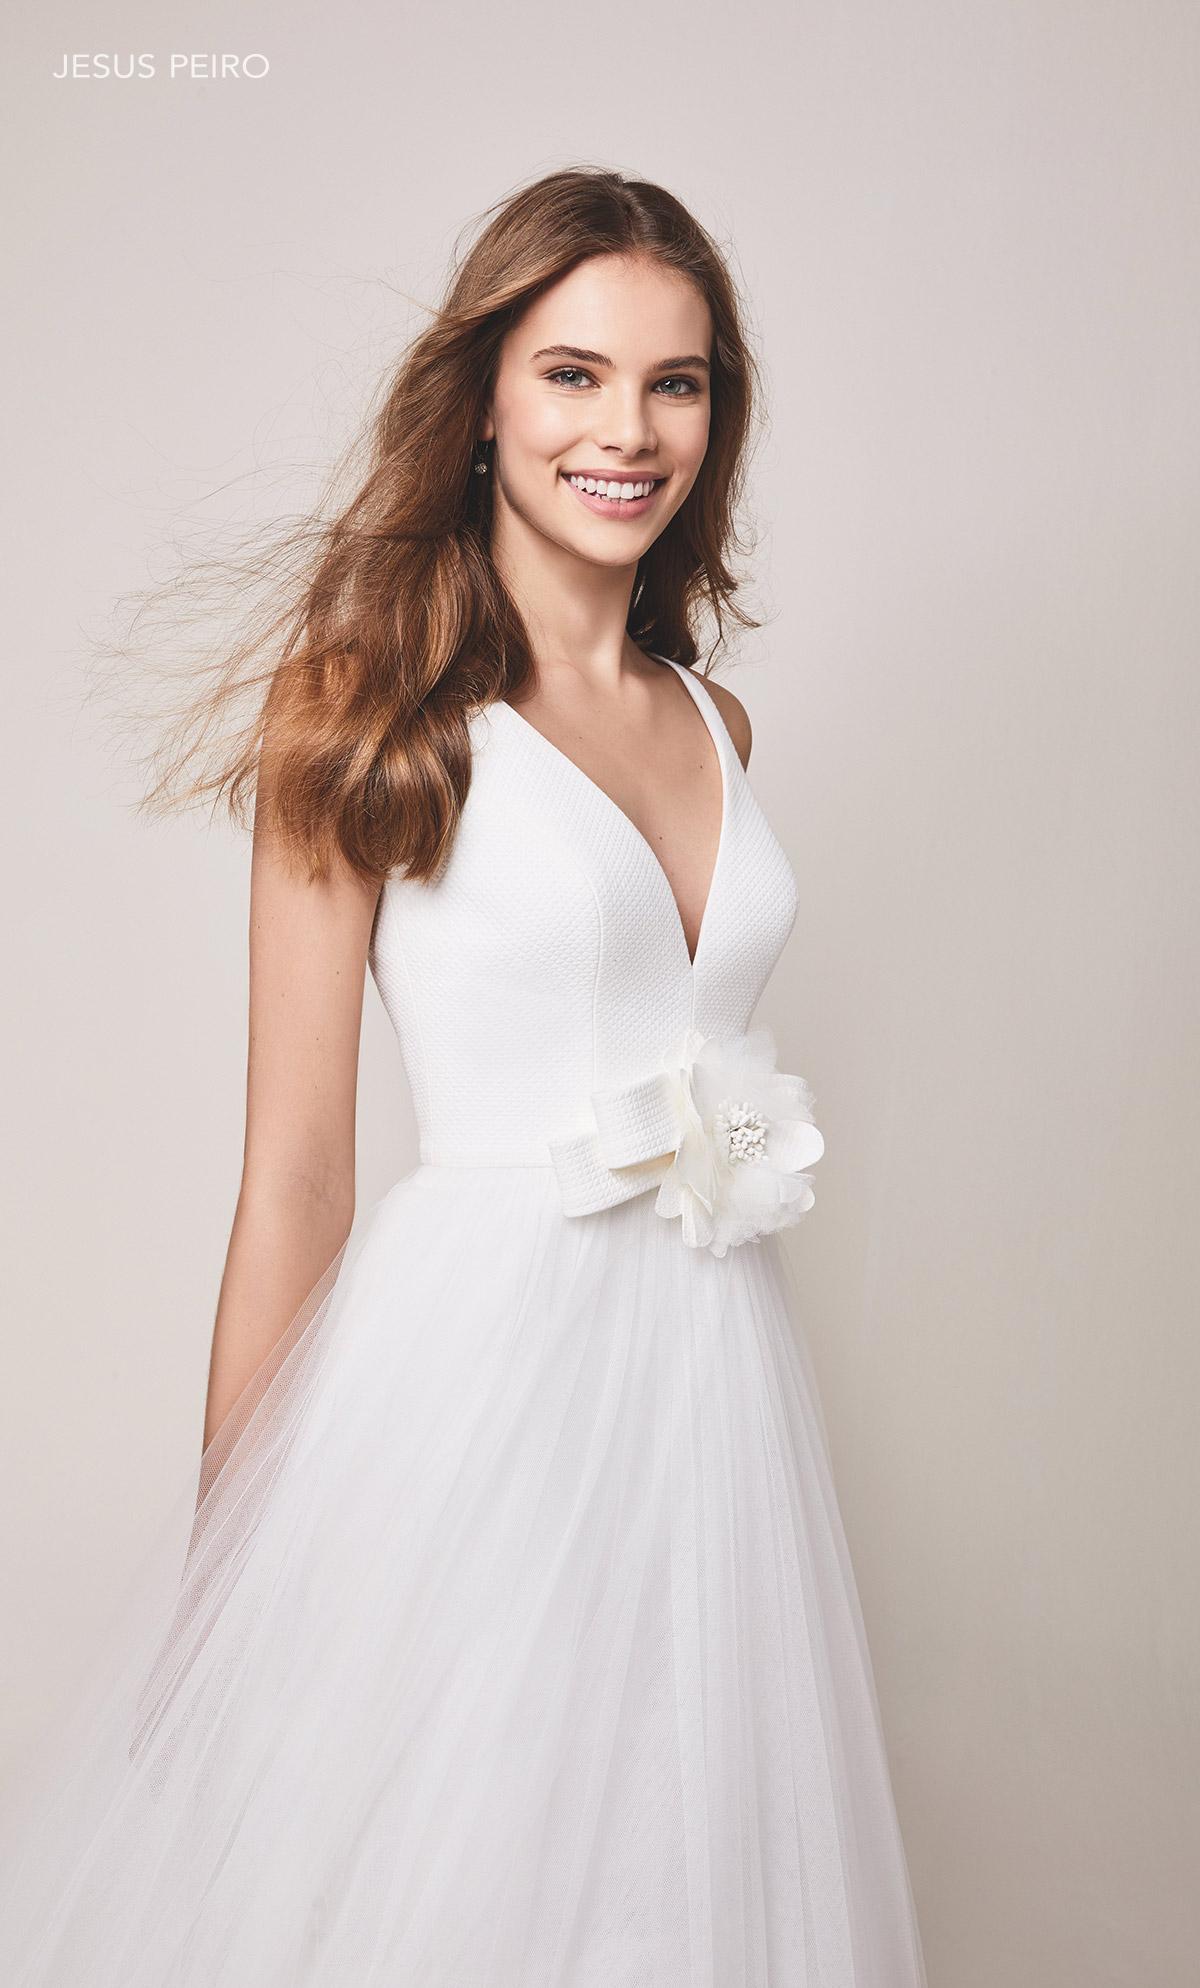 Vestido novia Jesús Peiró Ref.109